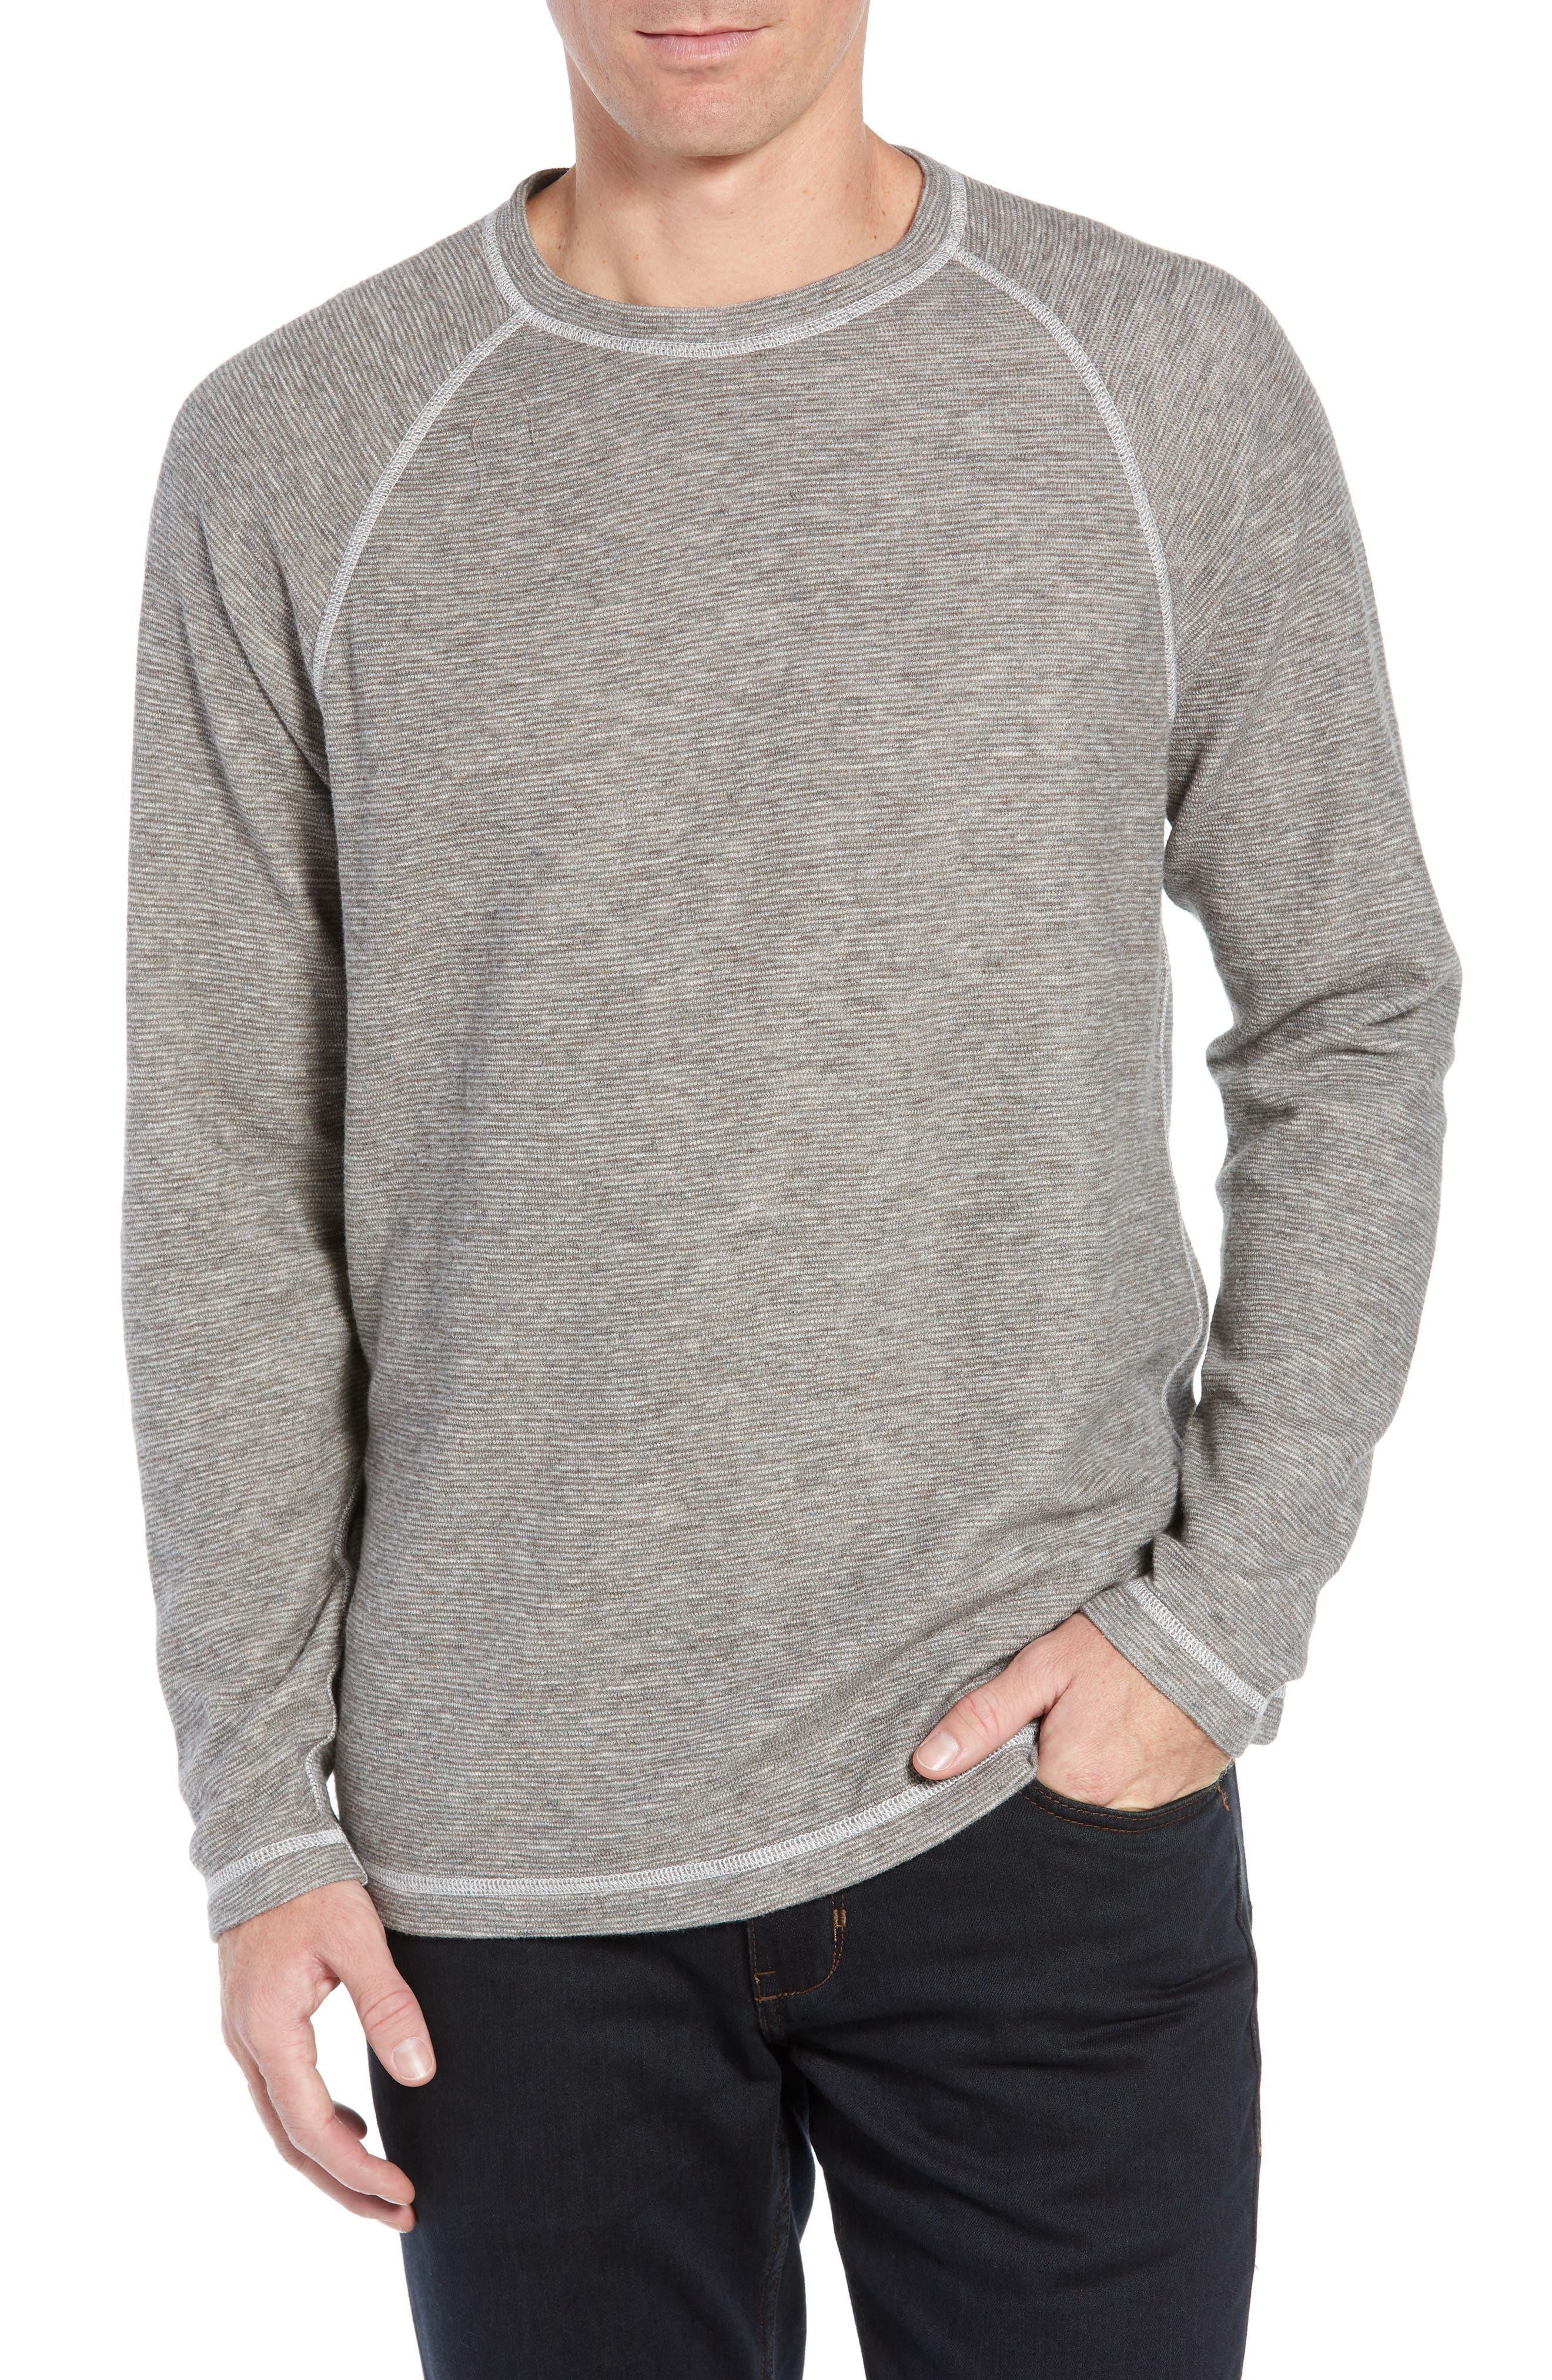 Fortuna Flip Regular Fit Shirt,                         Main,                         color, TAUPE HEATHER